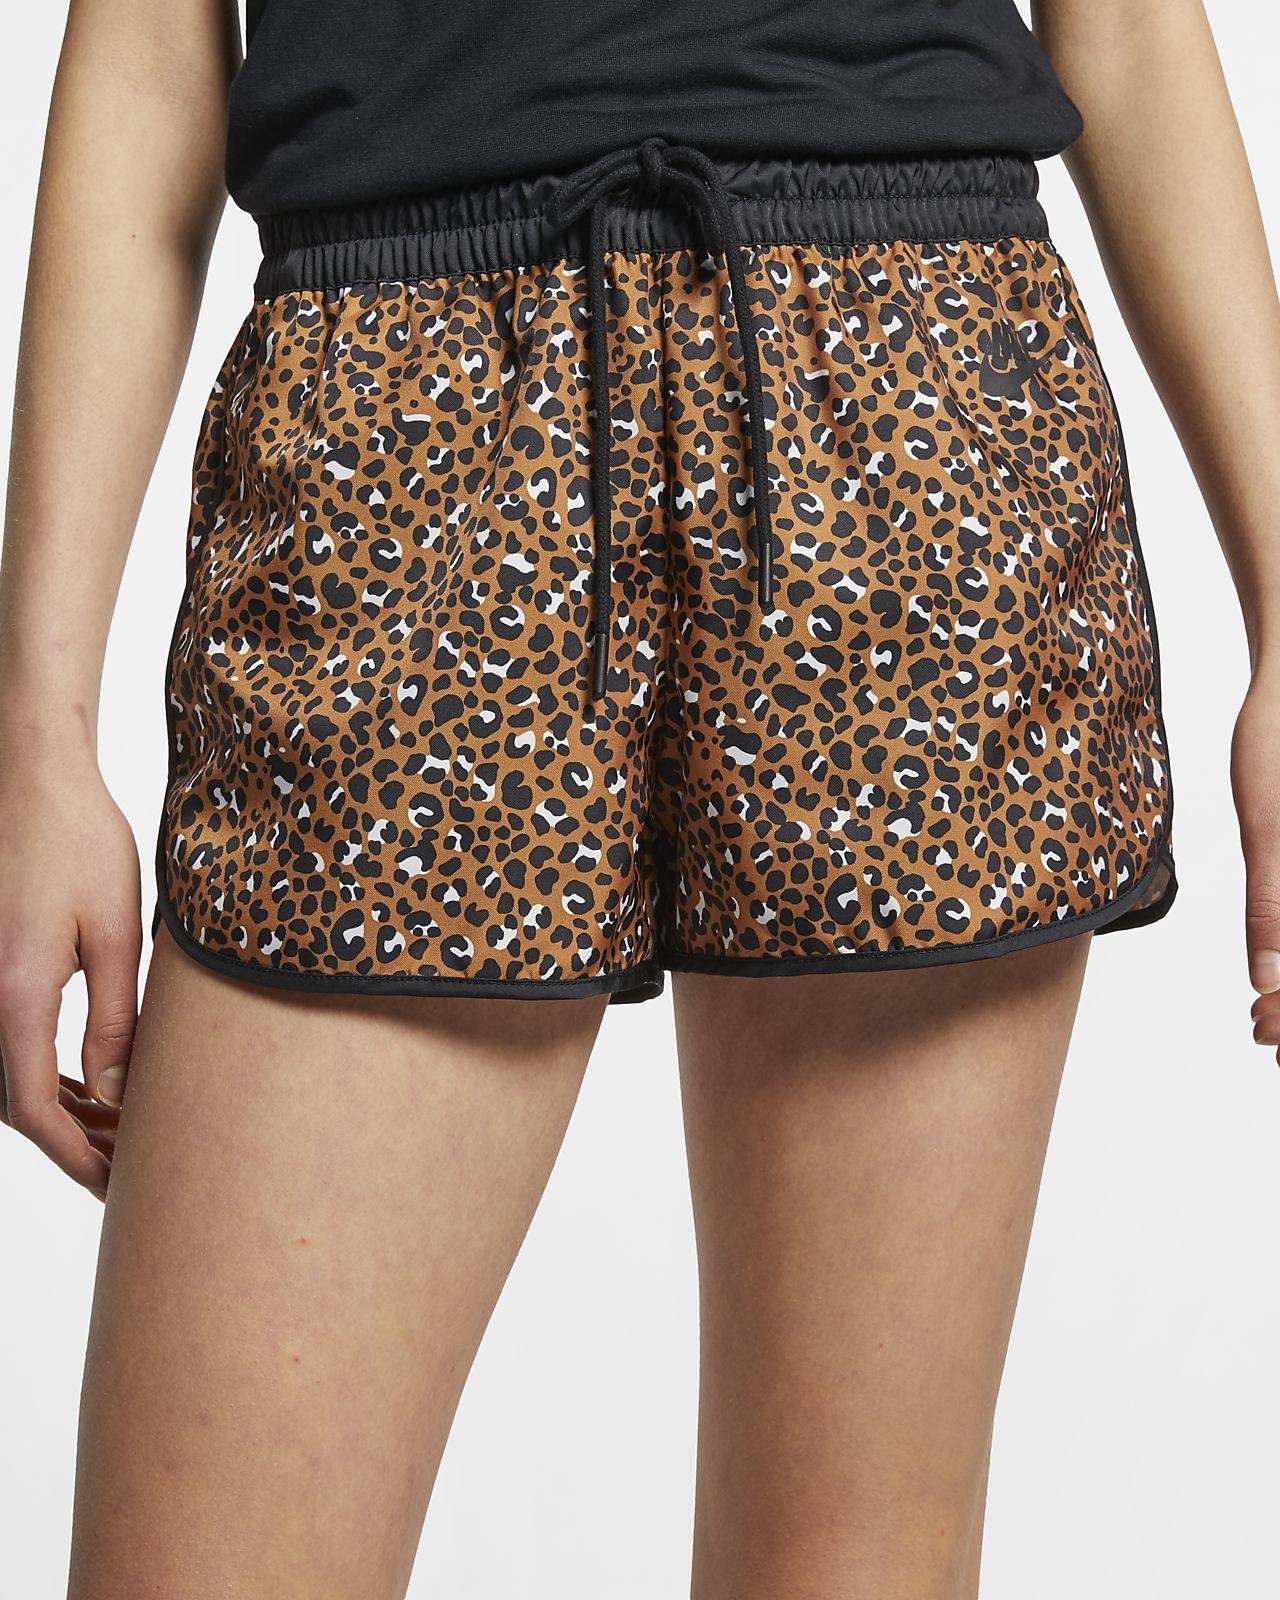 Nike Sportswear Animal Print Geweven damesshorts